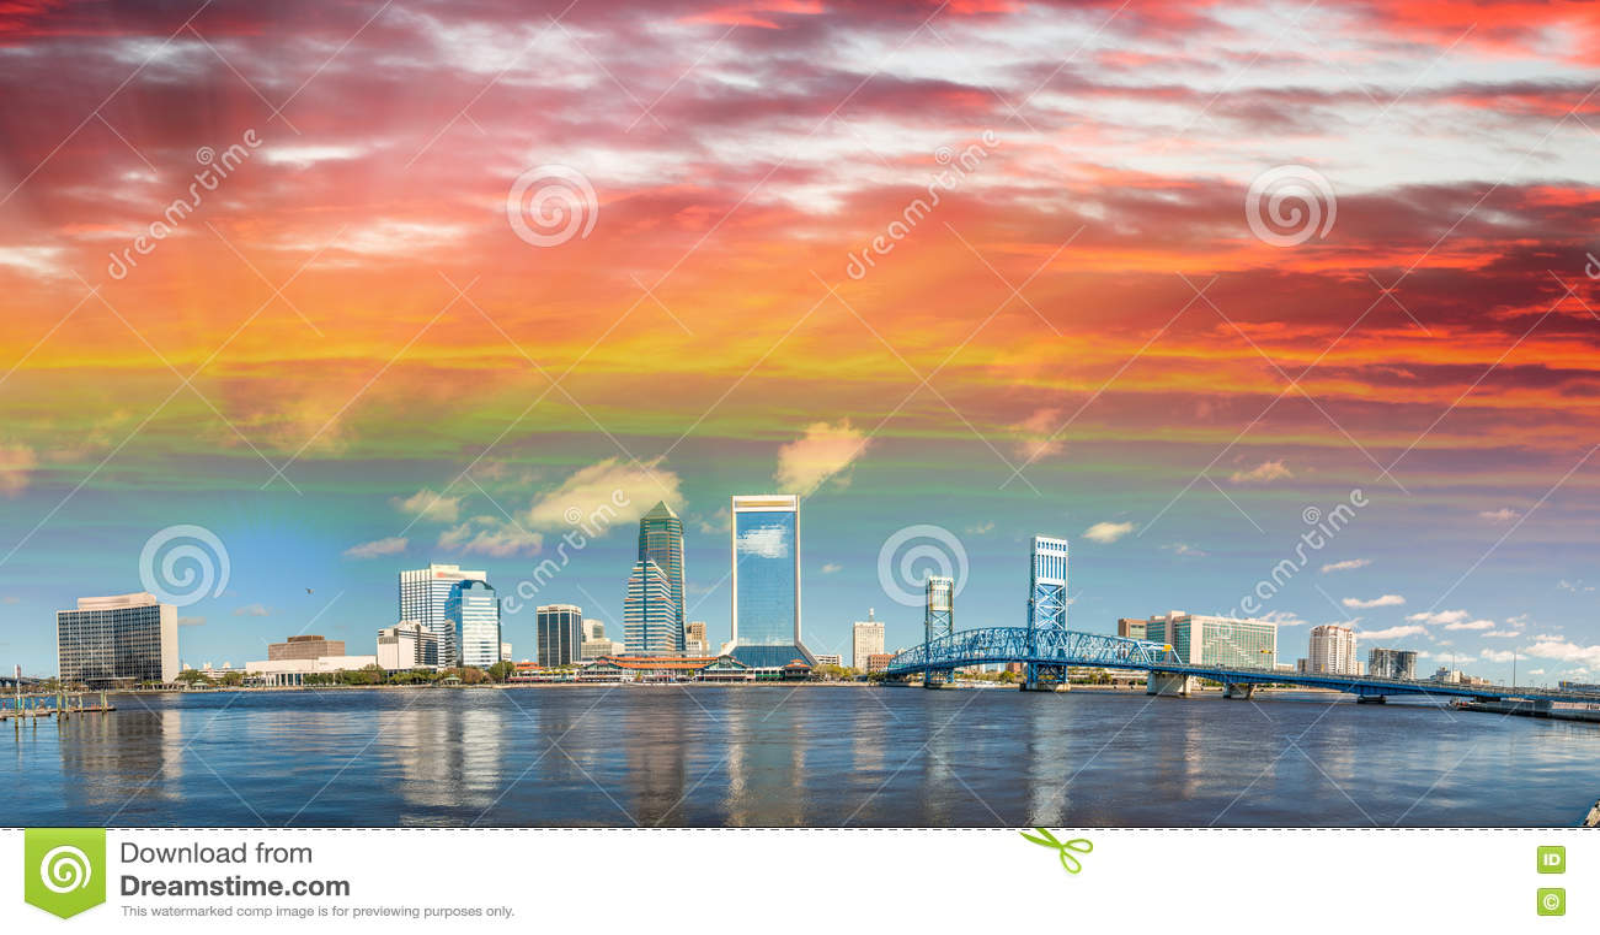 Panoramic view of Jacksonville skyline at dusk, Florida